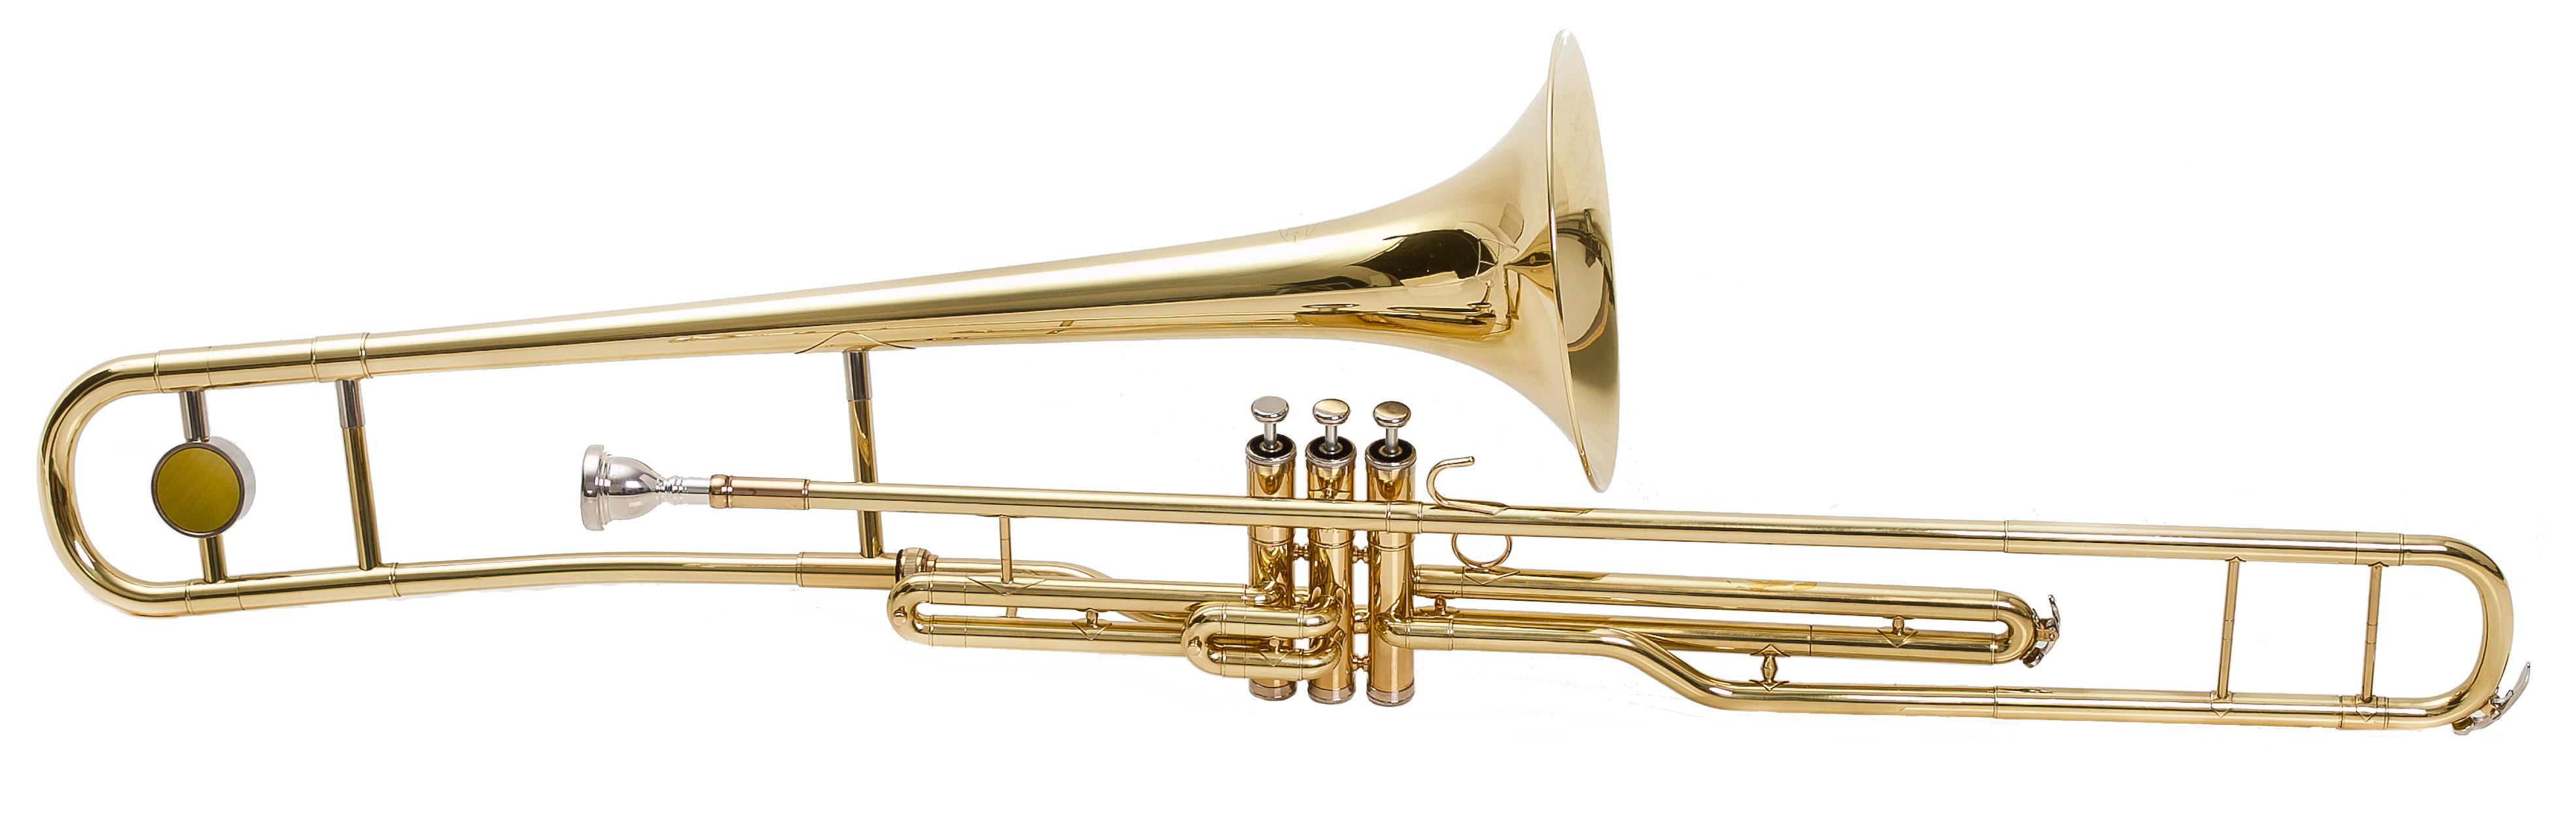 Trombone Pisto HTTC-25L Do